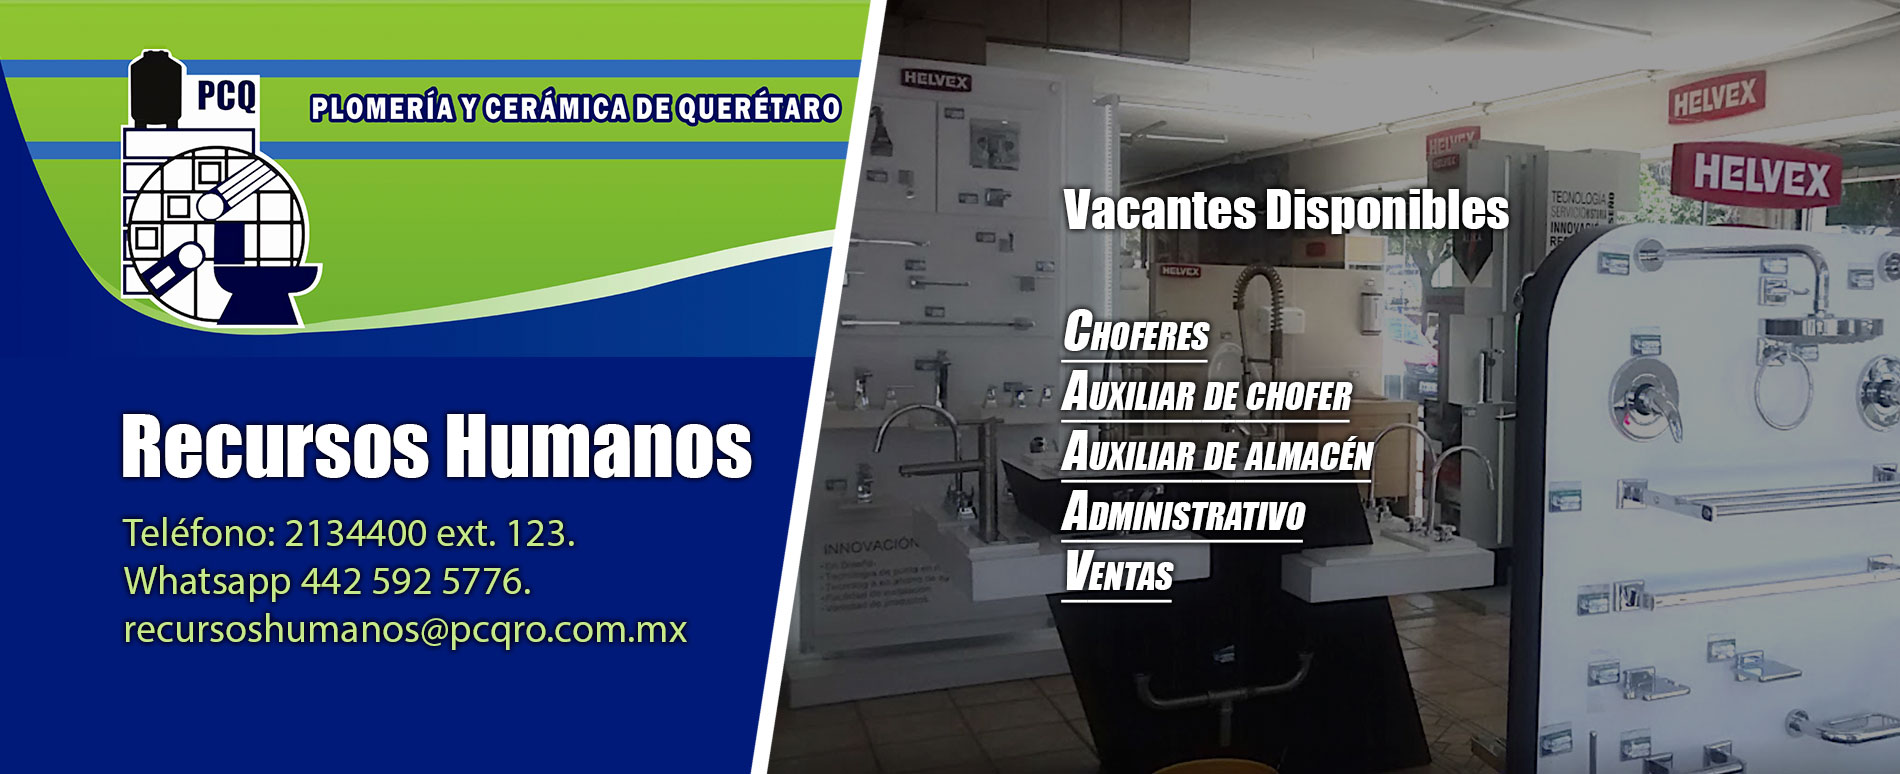 RH recursos Humanos PCQ vacantes disponibles.